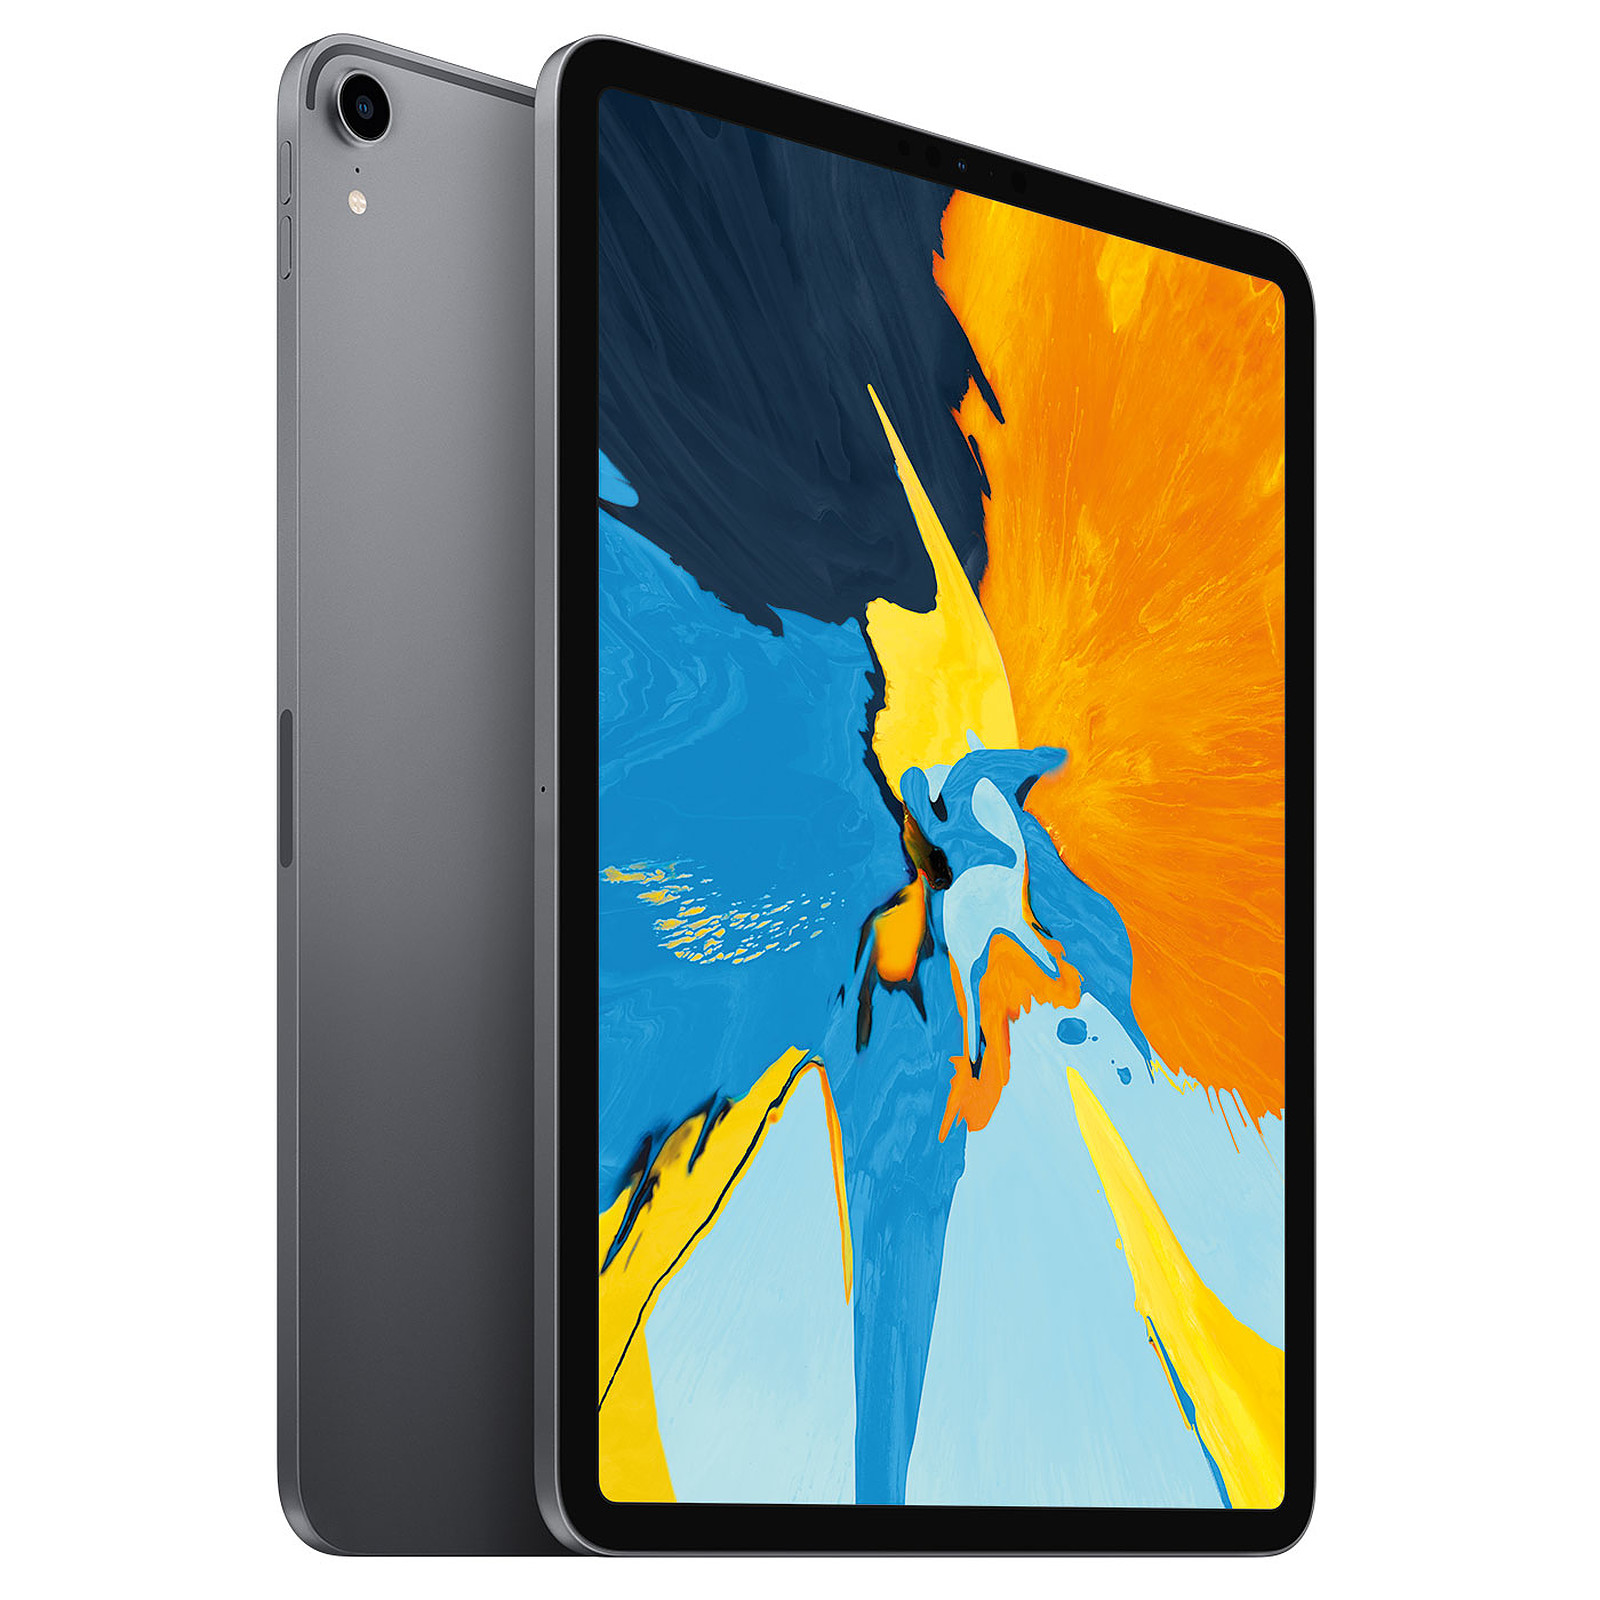 Apple iPad Pro (2018) 11 pouces 64 Go Wi-Fi Gris Sidéral